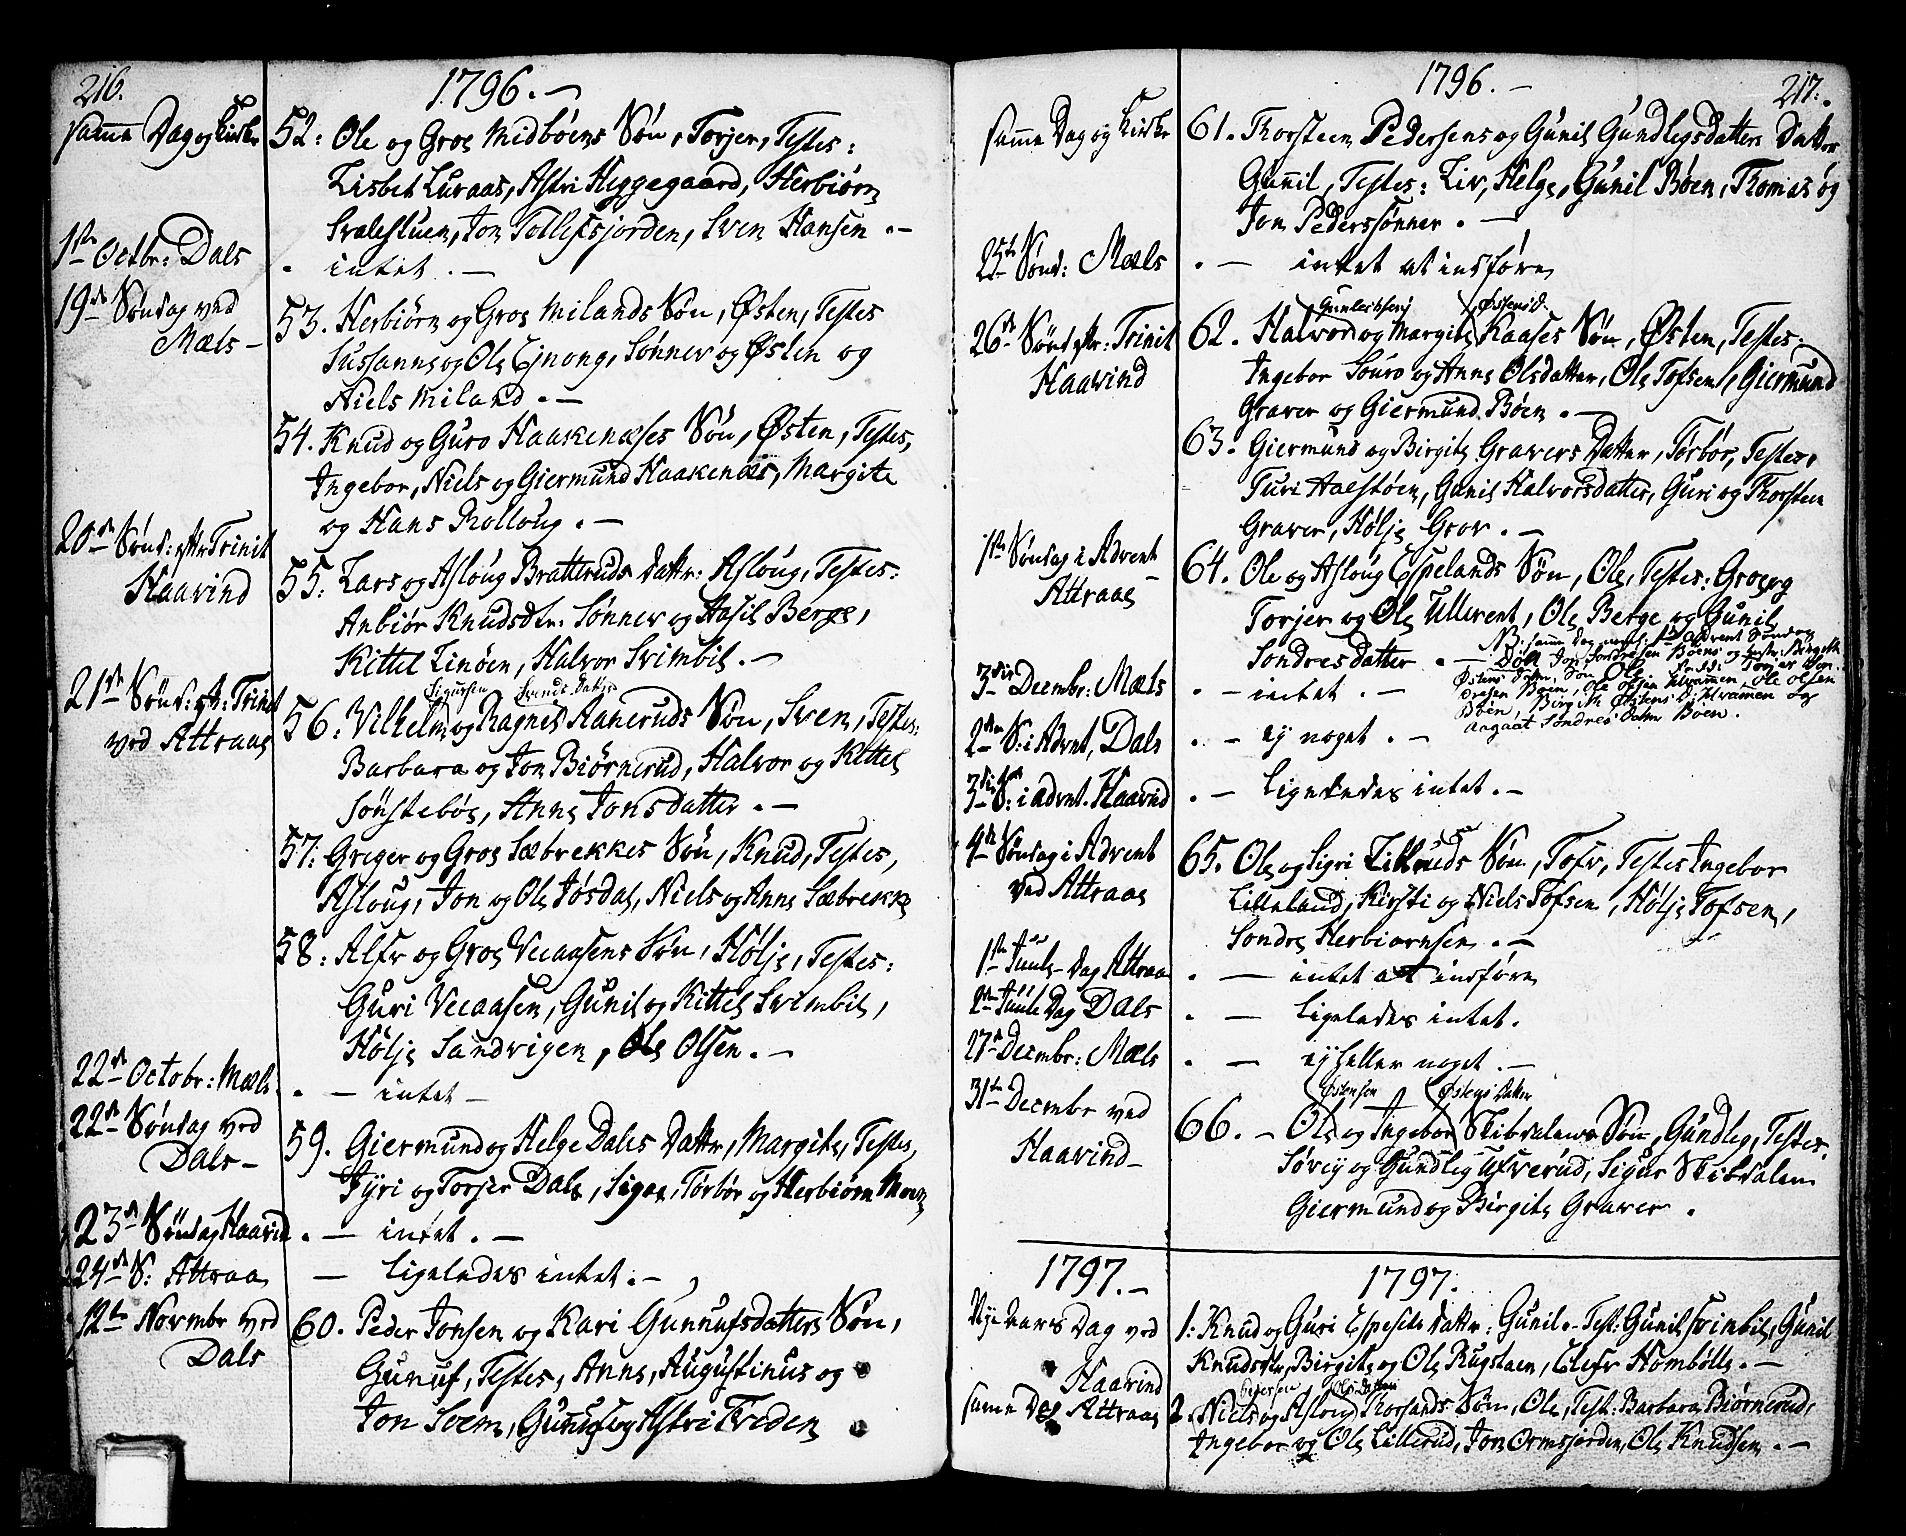 SAKO, Tinn kirkebøker, F/Fa/L0002: Ministerialbok nr. I 2, 1757-1810, s. 216-217